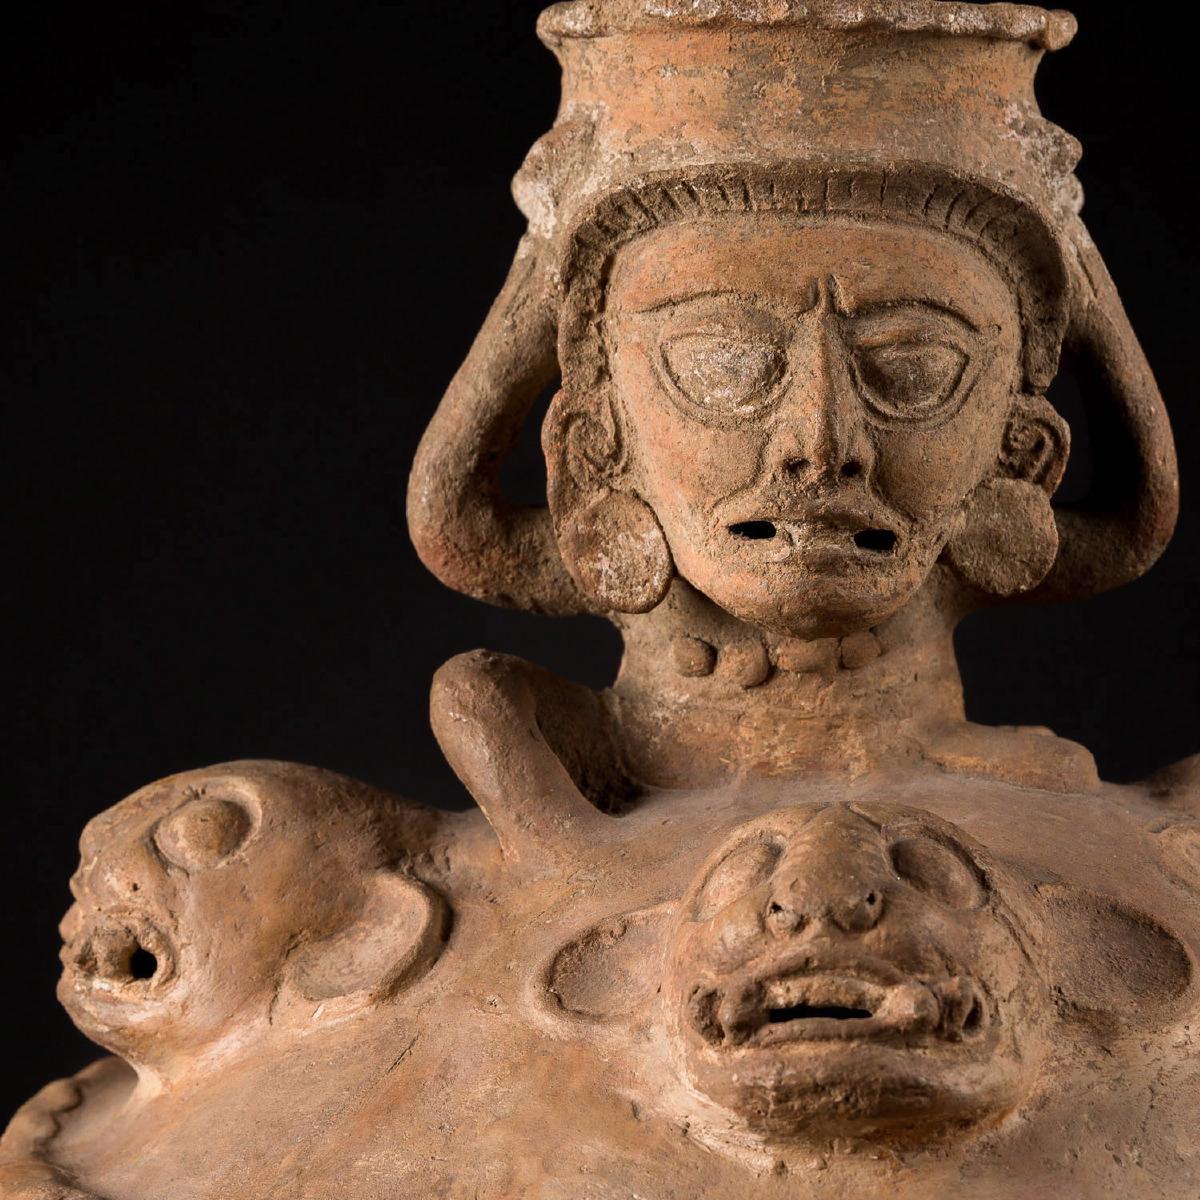 Photo of maya-urn-censer-kaminaljuyu-guatemala-expert-mesoamerica